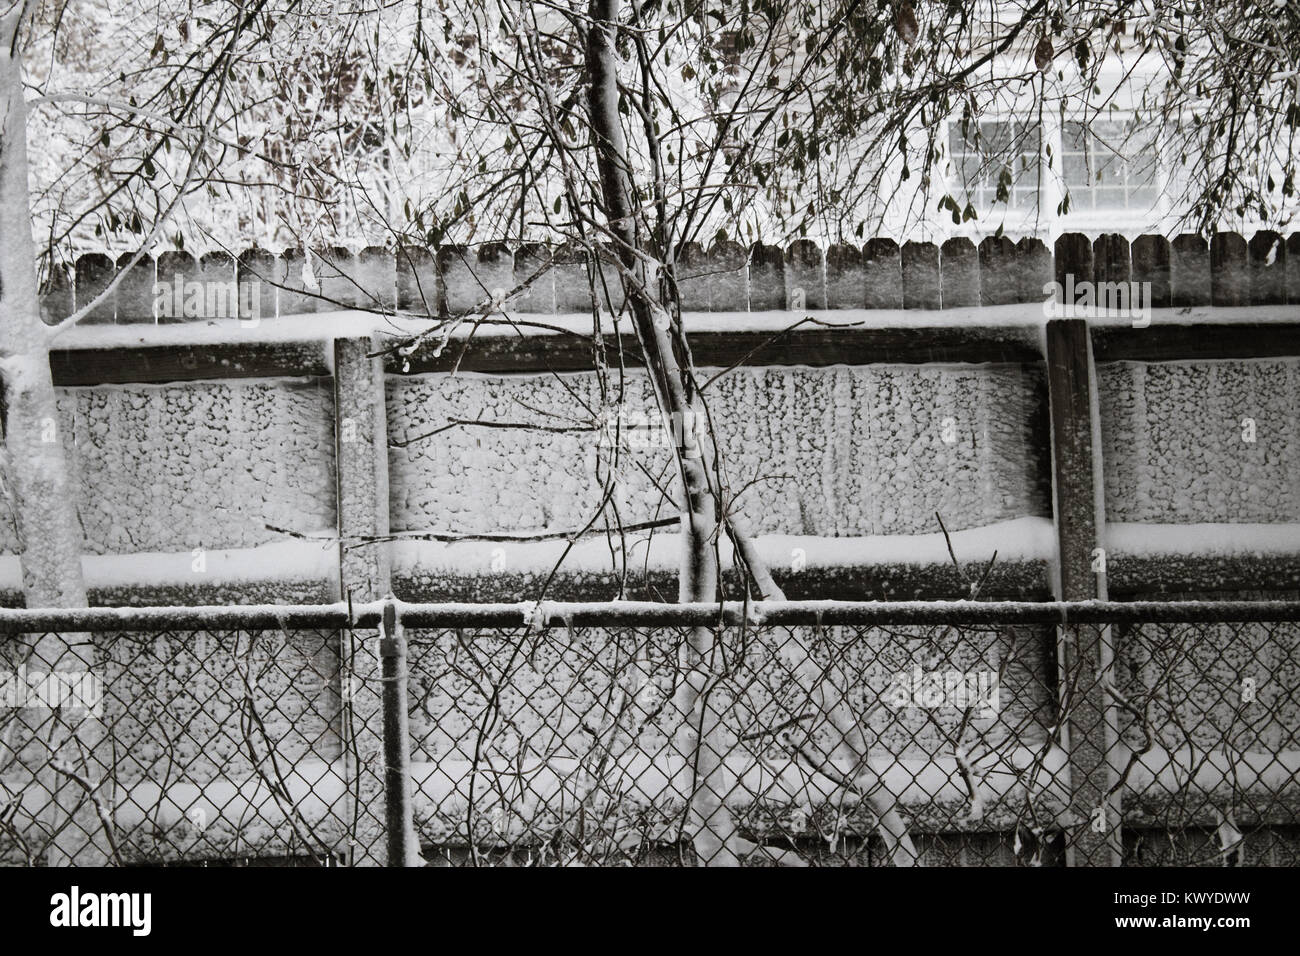 Schneebedeckte Zaun Stockbild